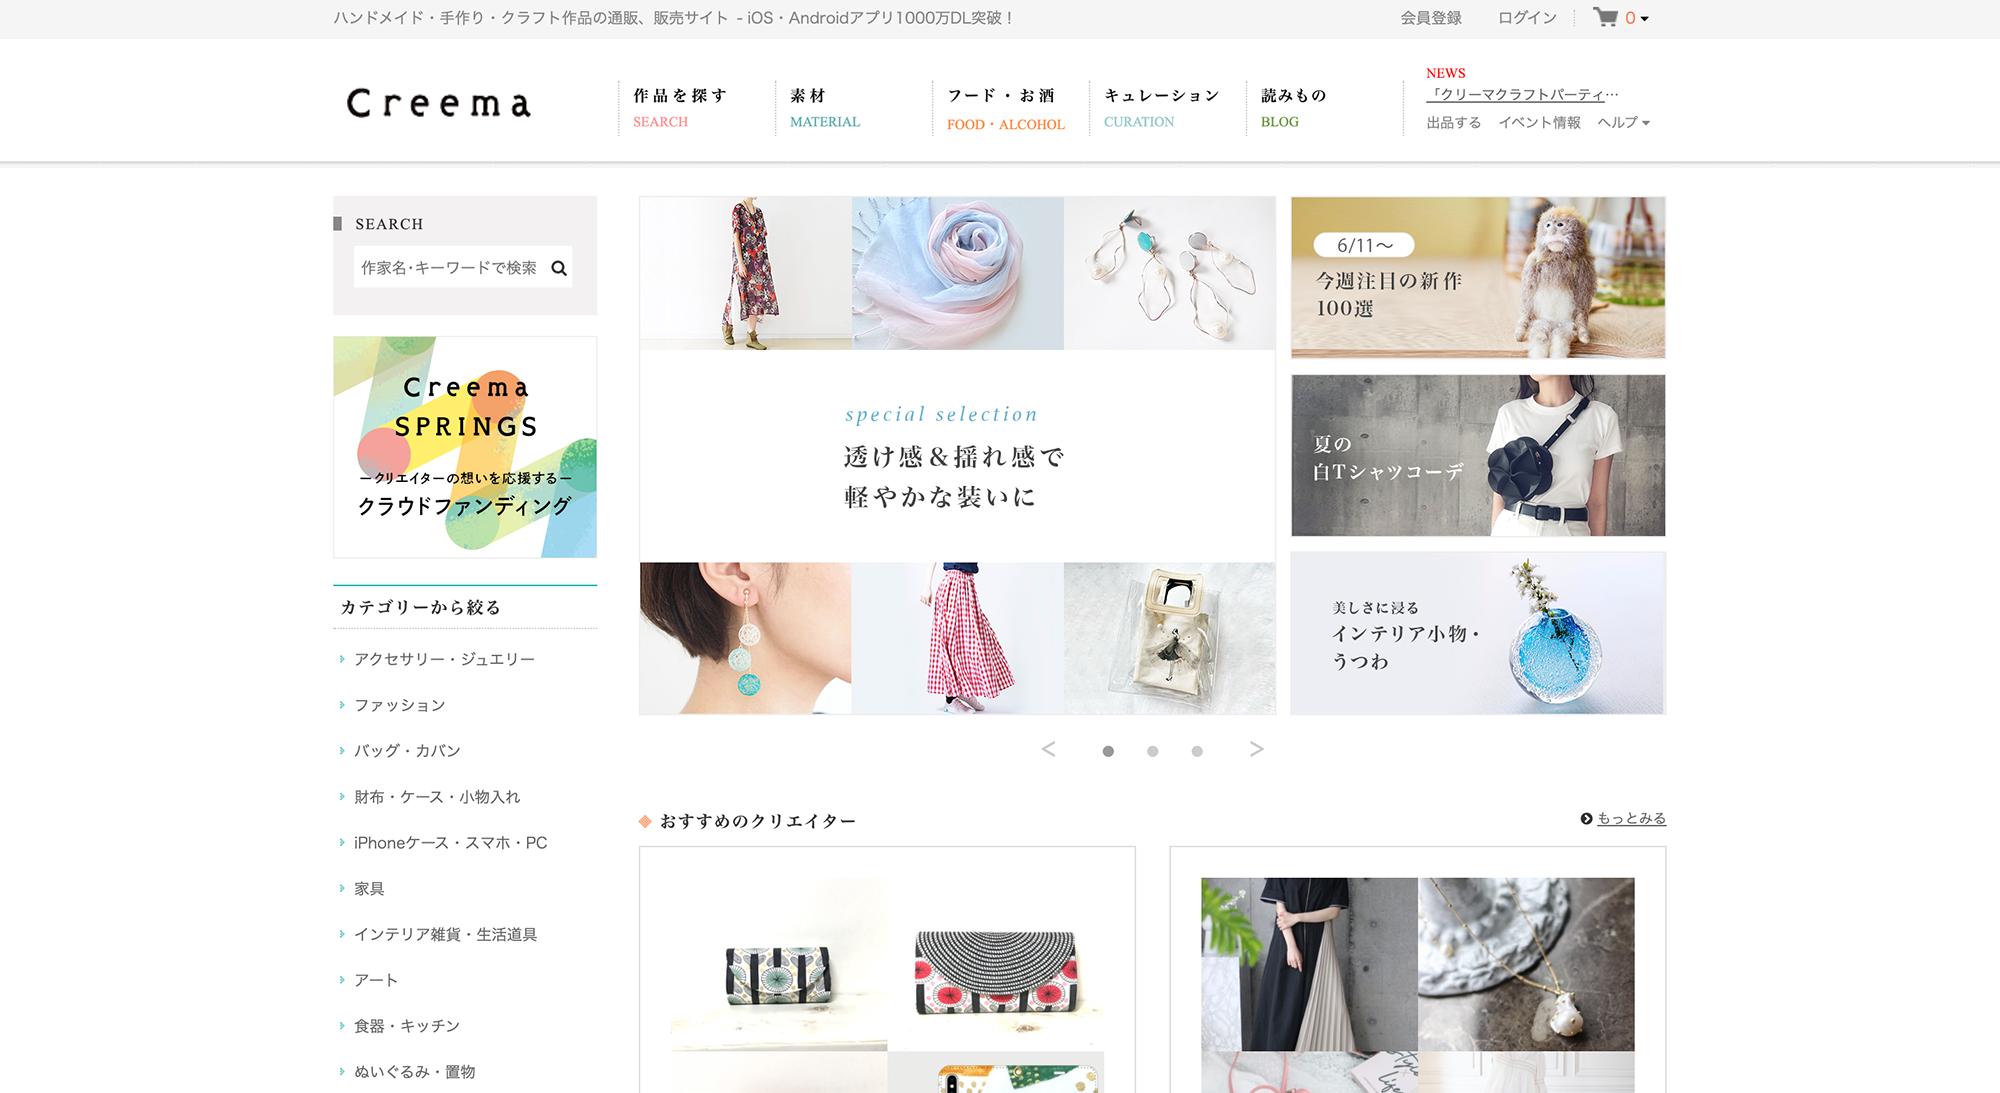 Creema公式サイトのトップページ